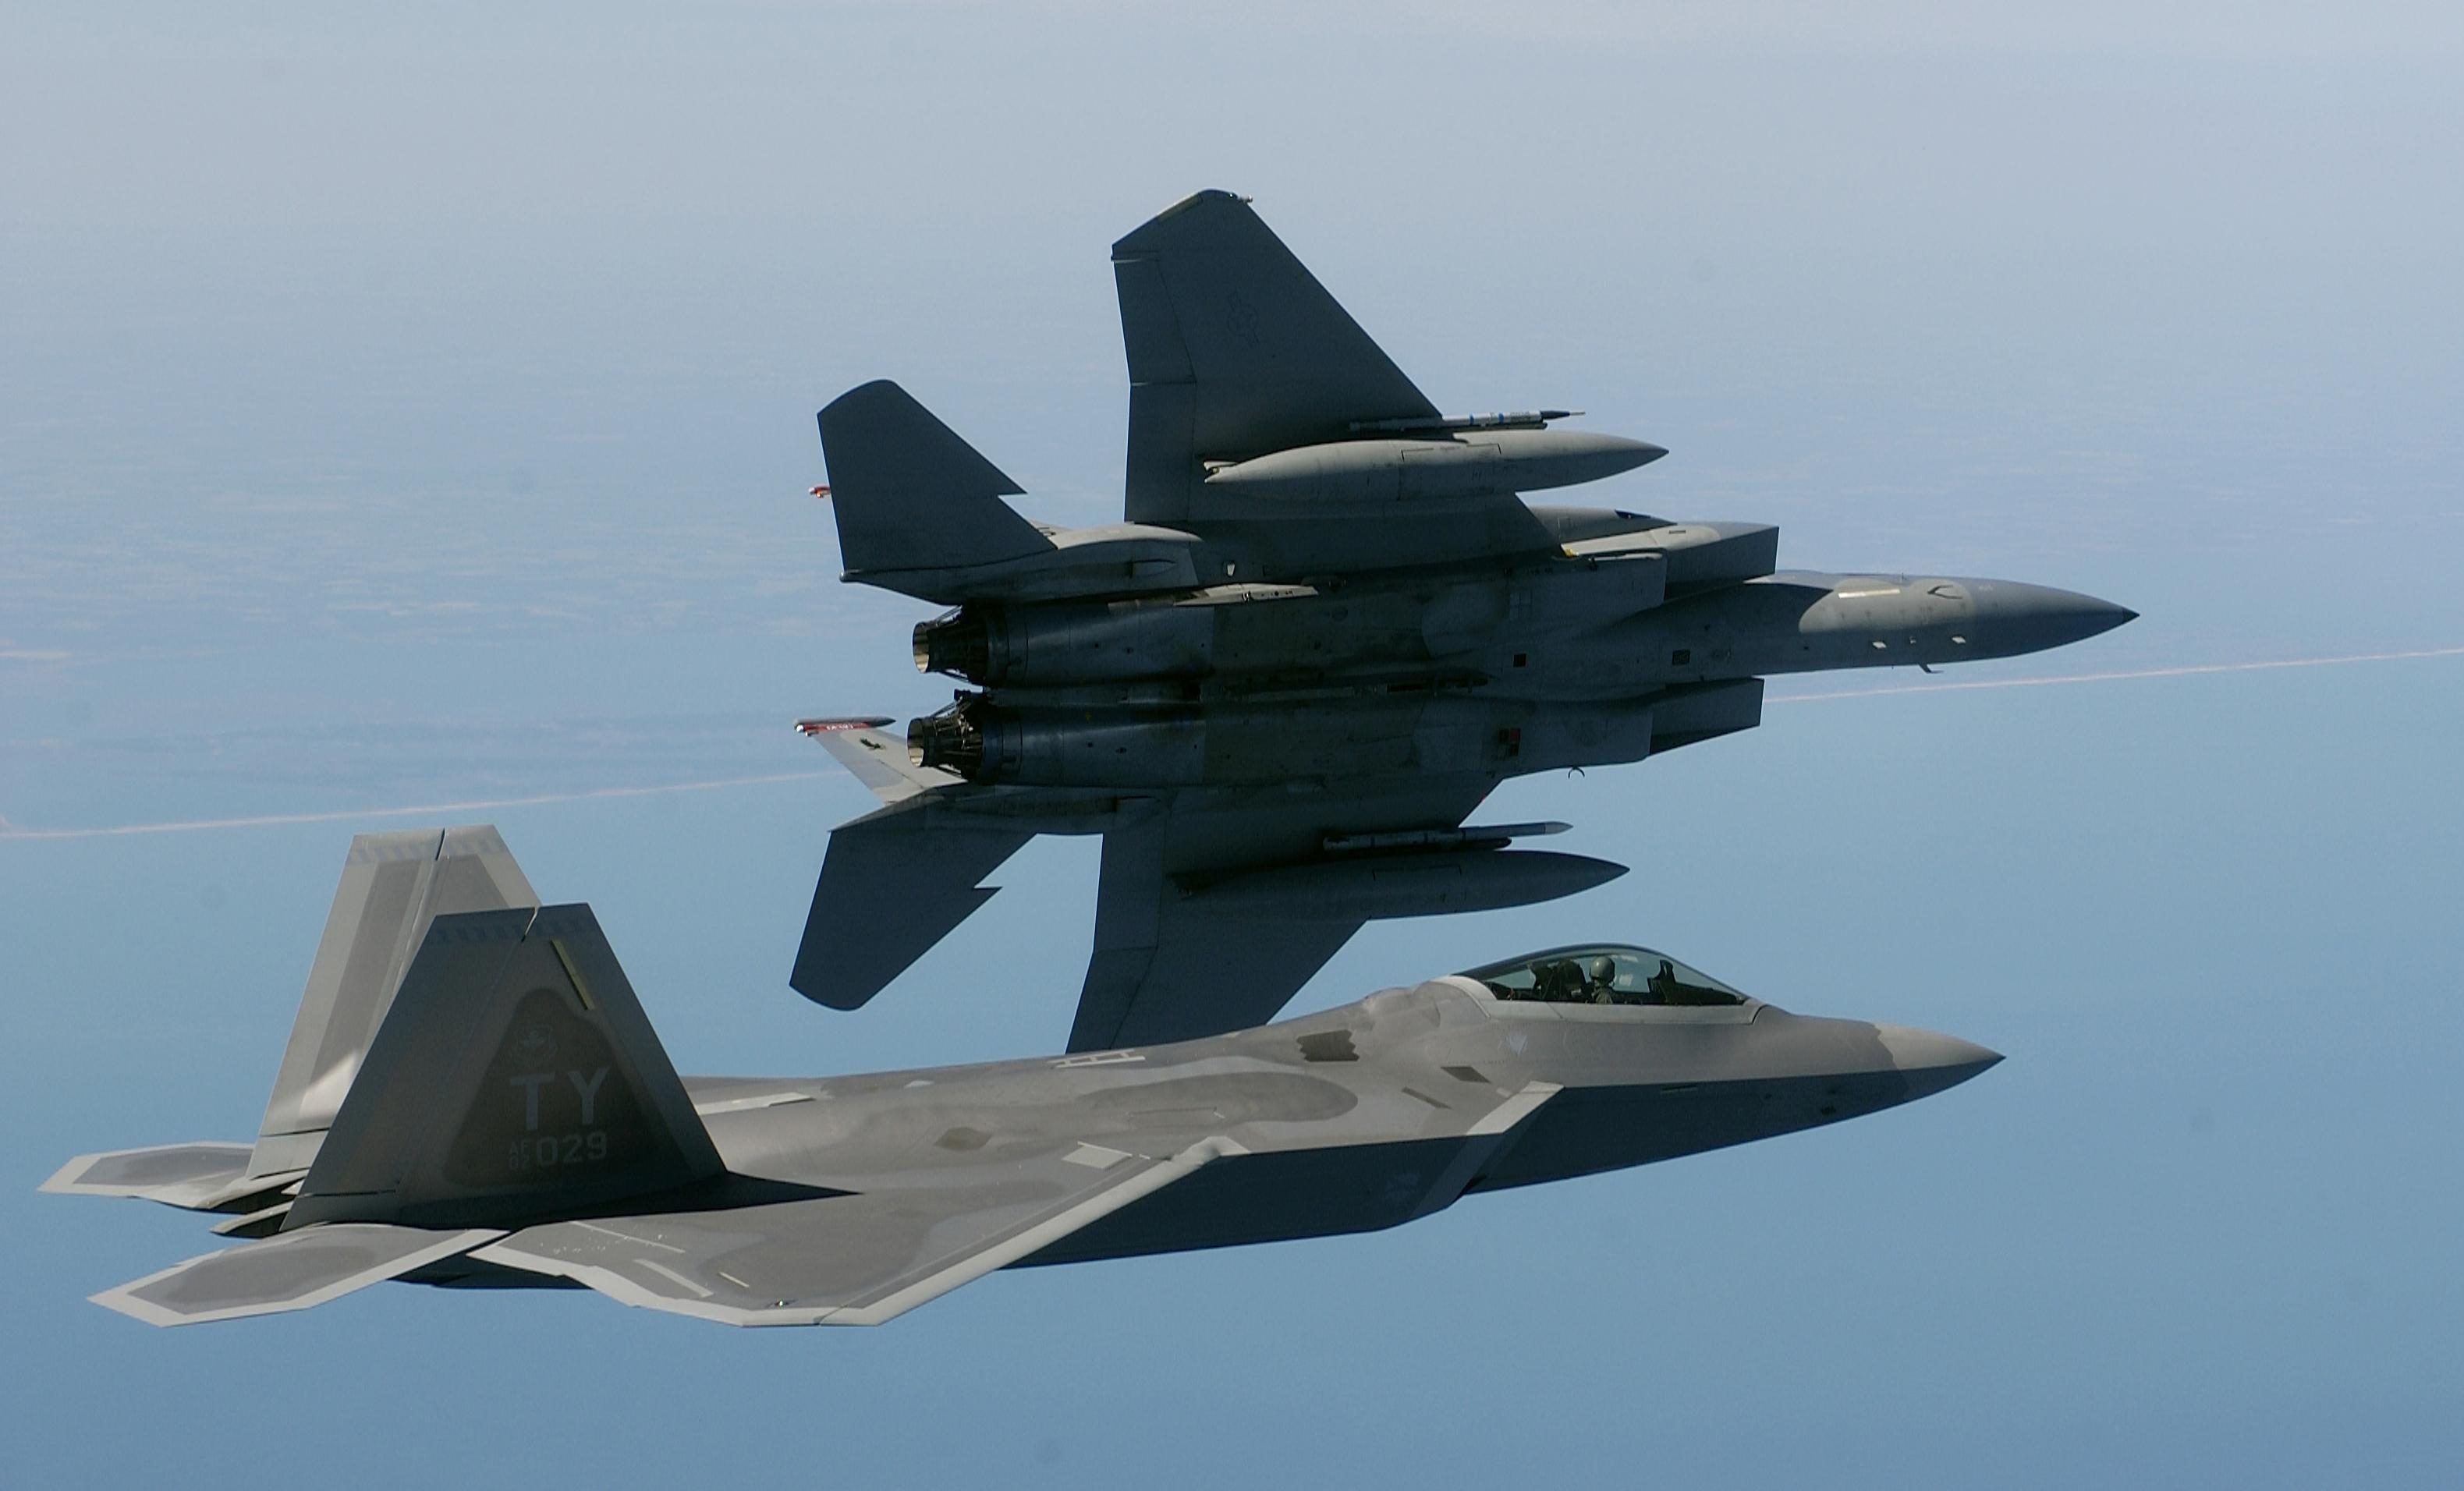 File:F-15 and F-22.JPG - Wikipedia